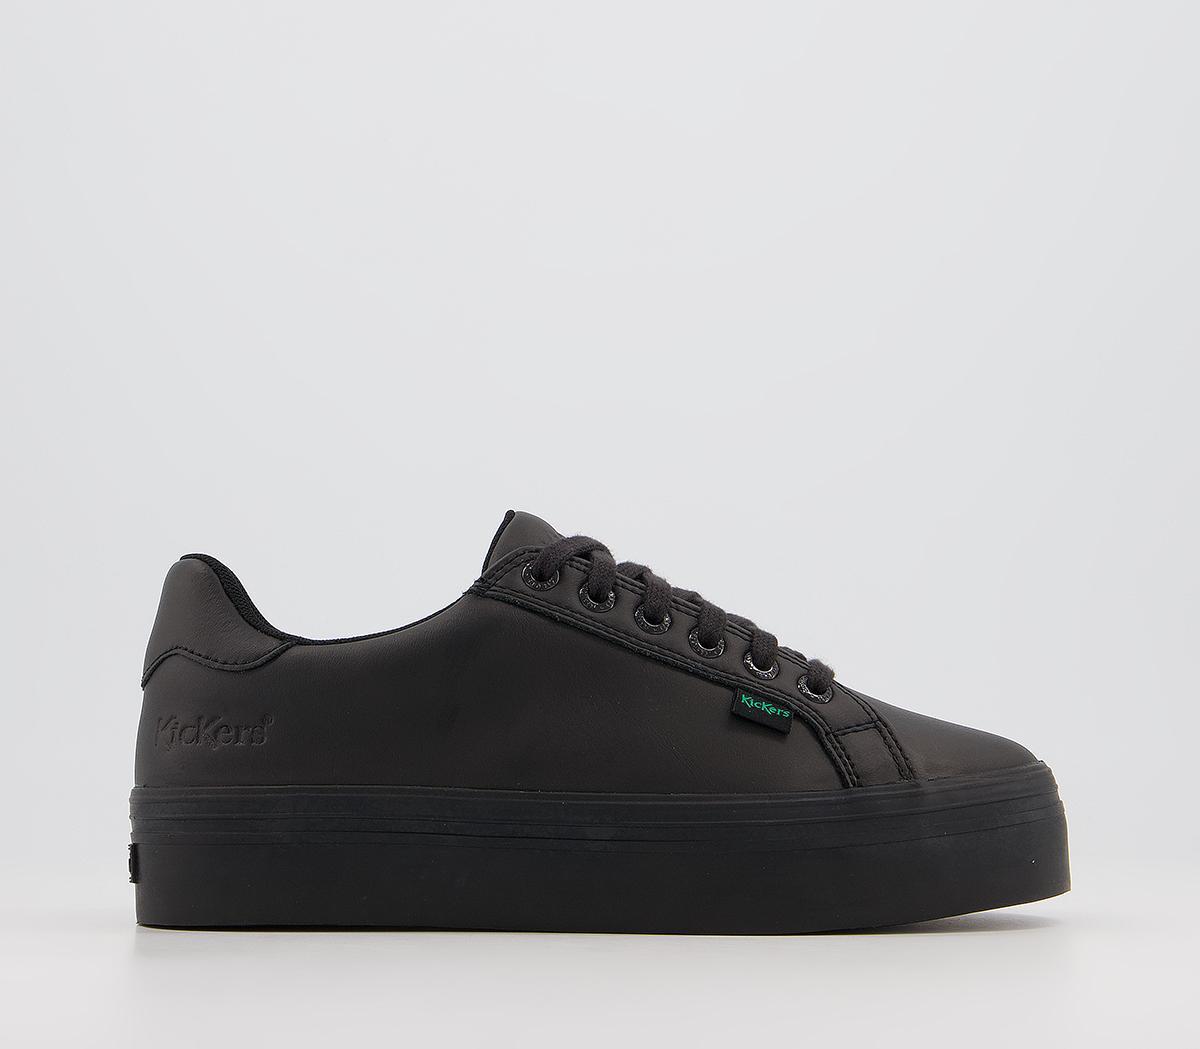 Tovni Platform Leather Youth Shoes